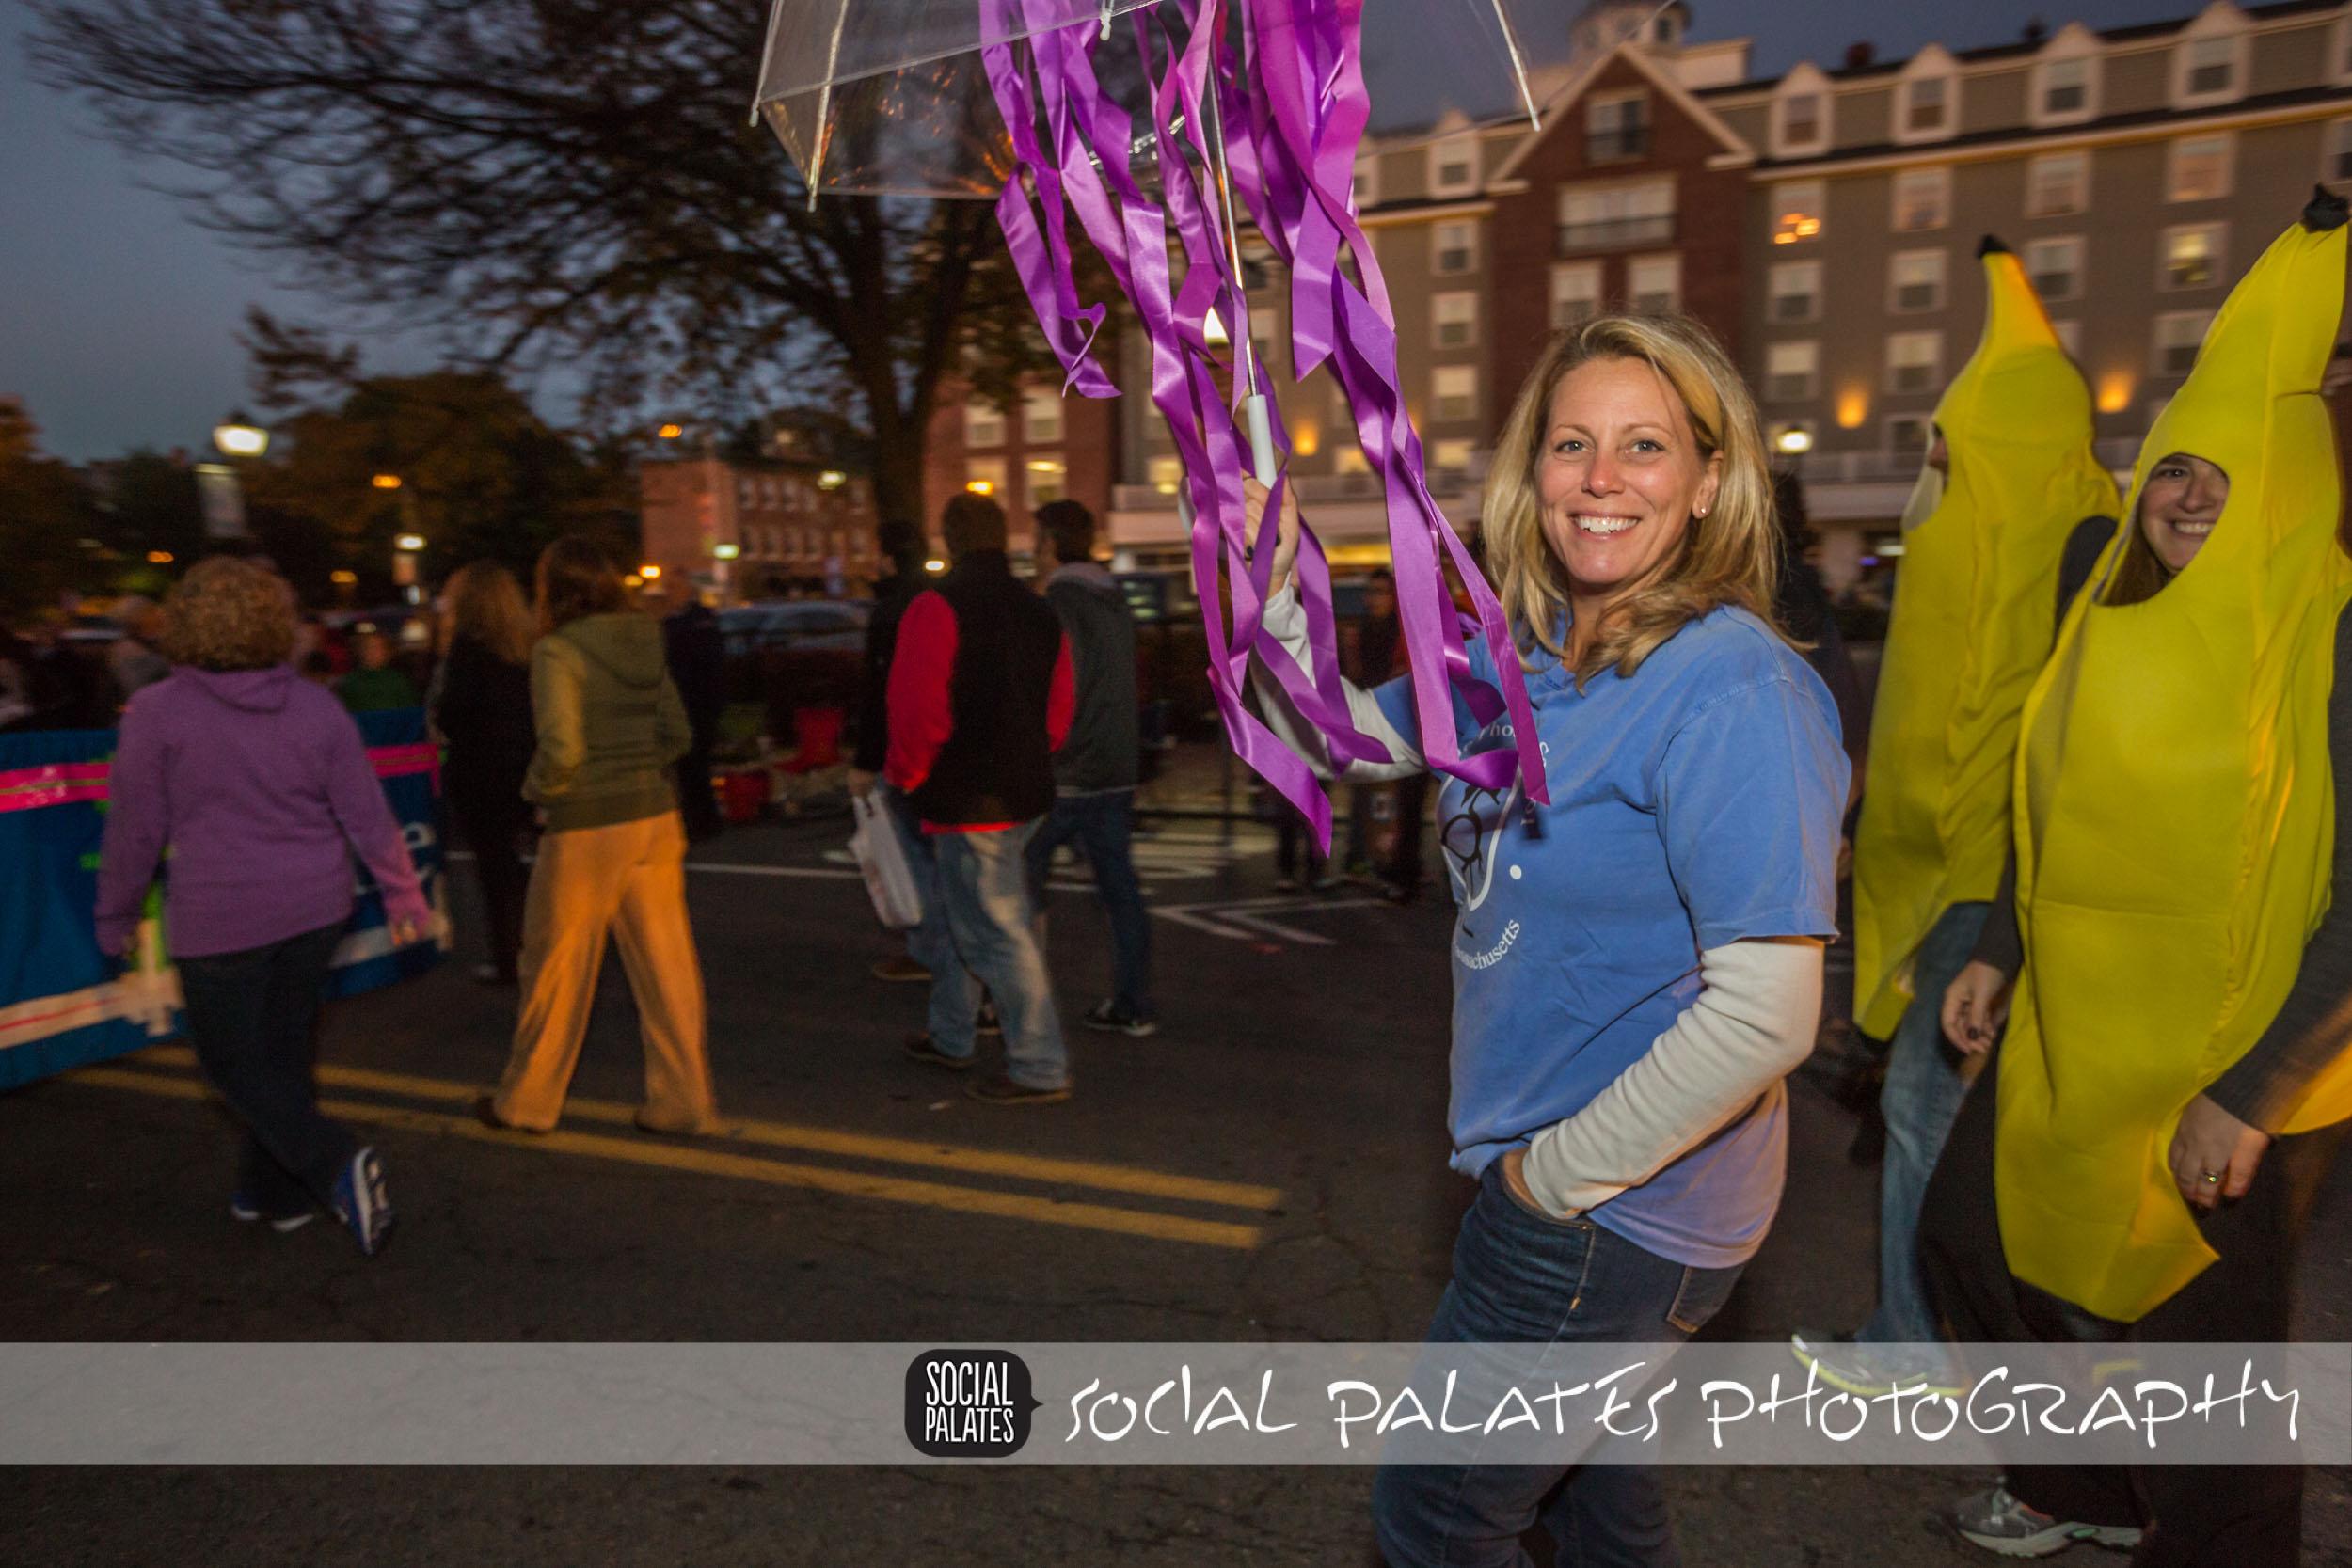 Haunted Happenings Parade 2014 Creative Salem by Social Palates-7401.jpg